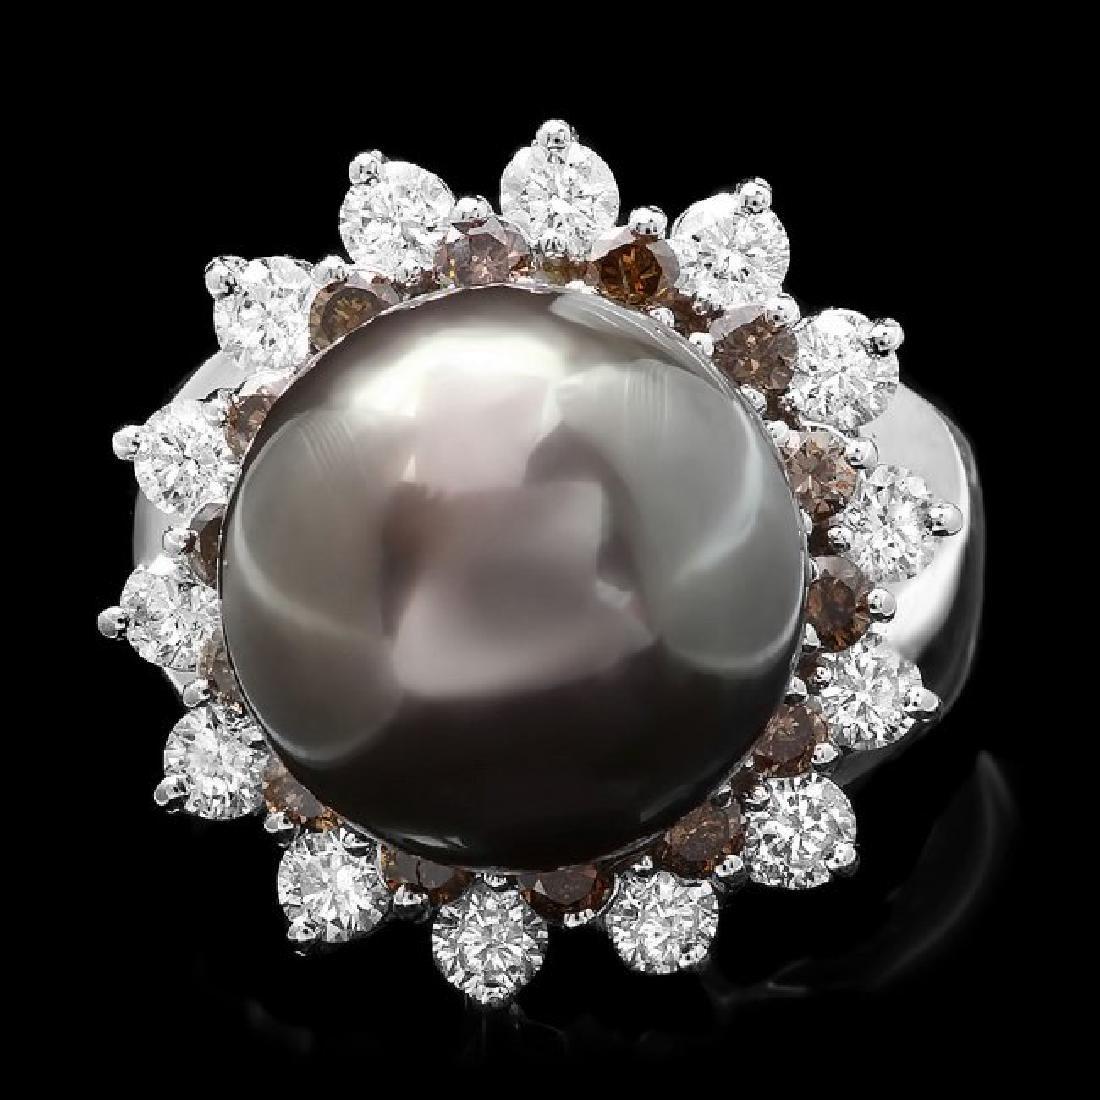 14k White Gold 13mm Pearl 1.6ct Diamond Ring